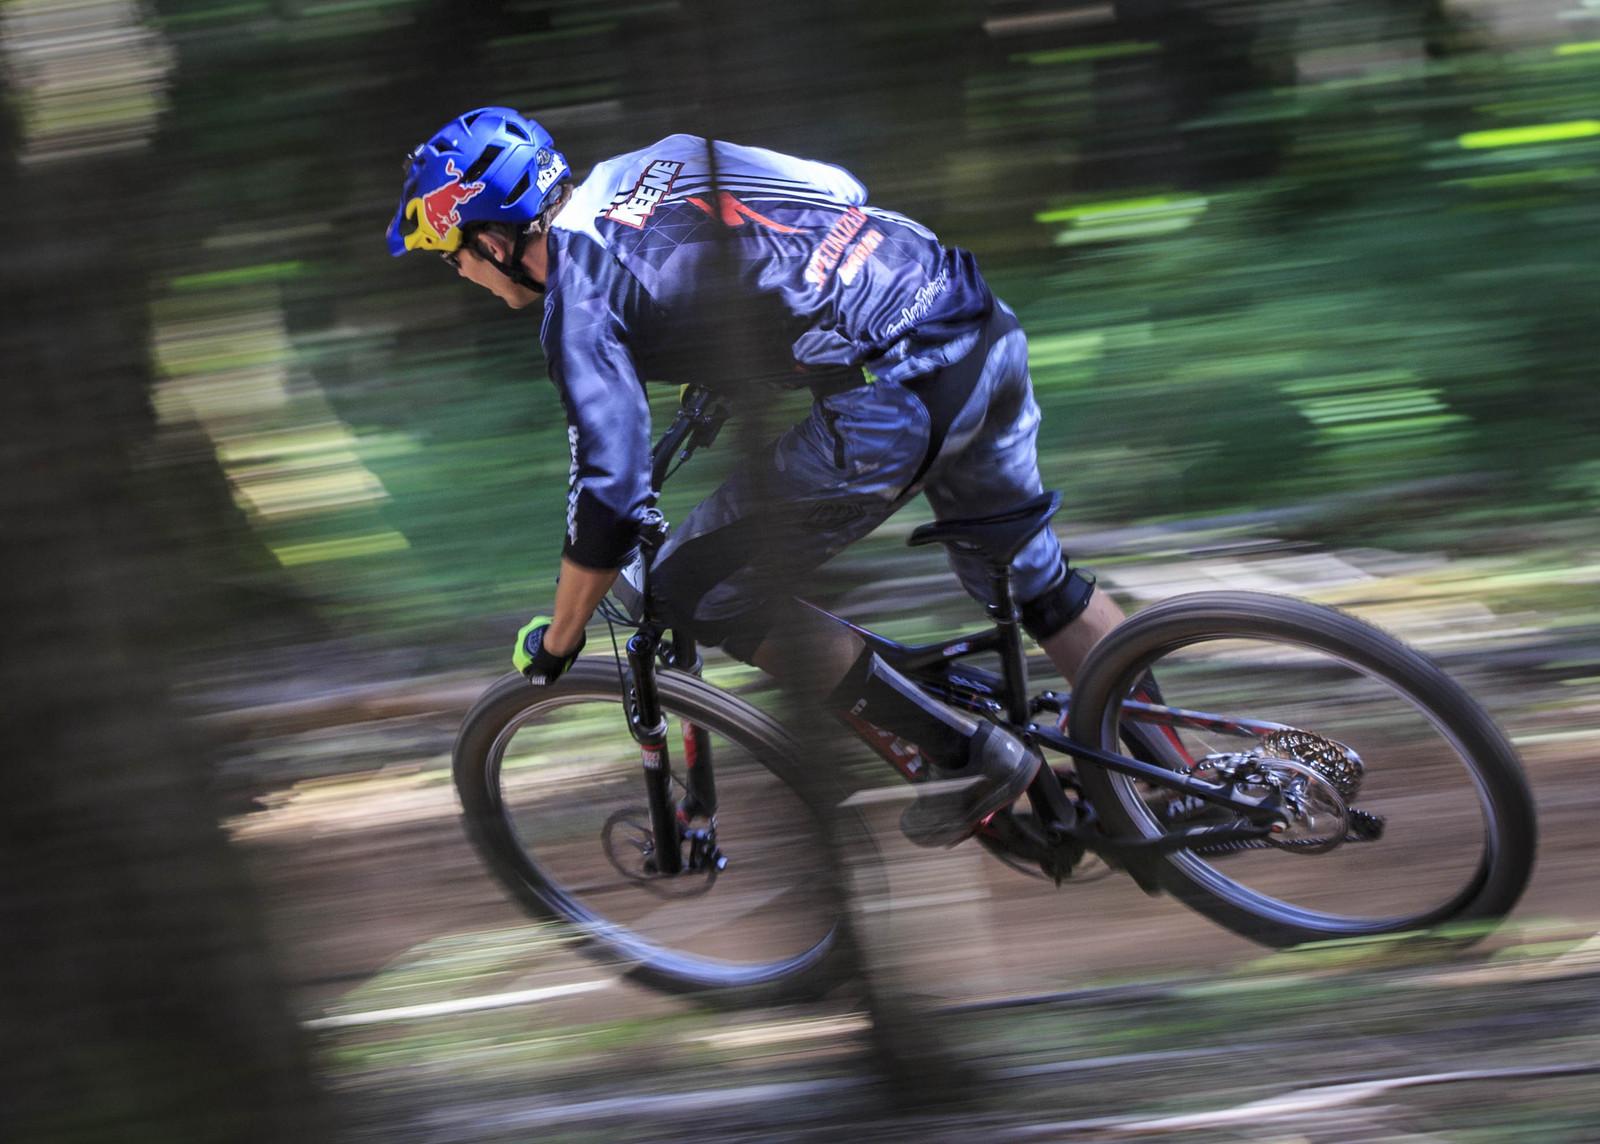 Race Report - Oregon Enduro Series, Hood River - Oregon Enduro Hood River - Mountain Biking Pictures - Vital MTB